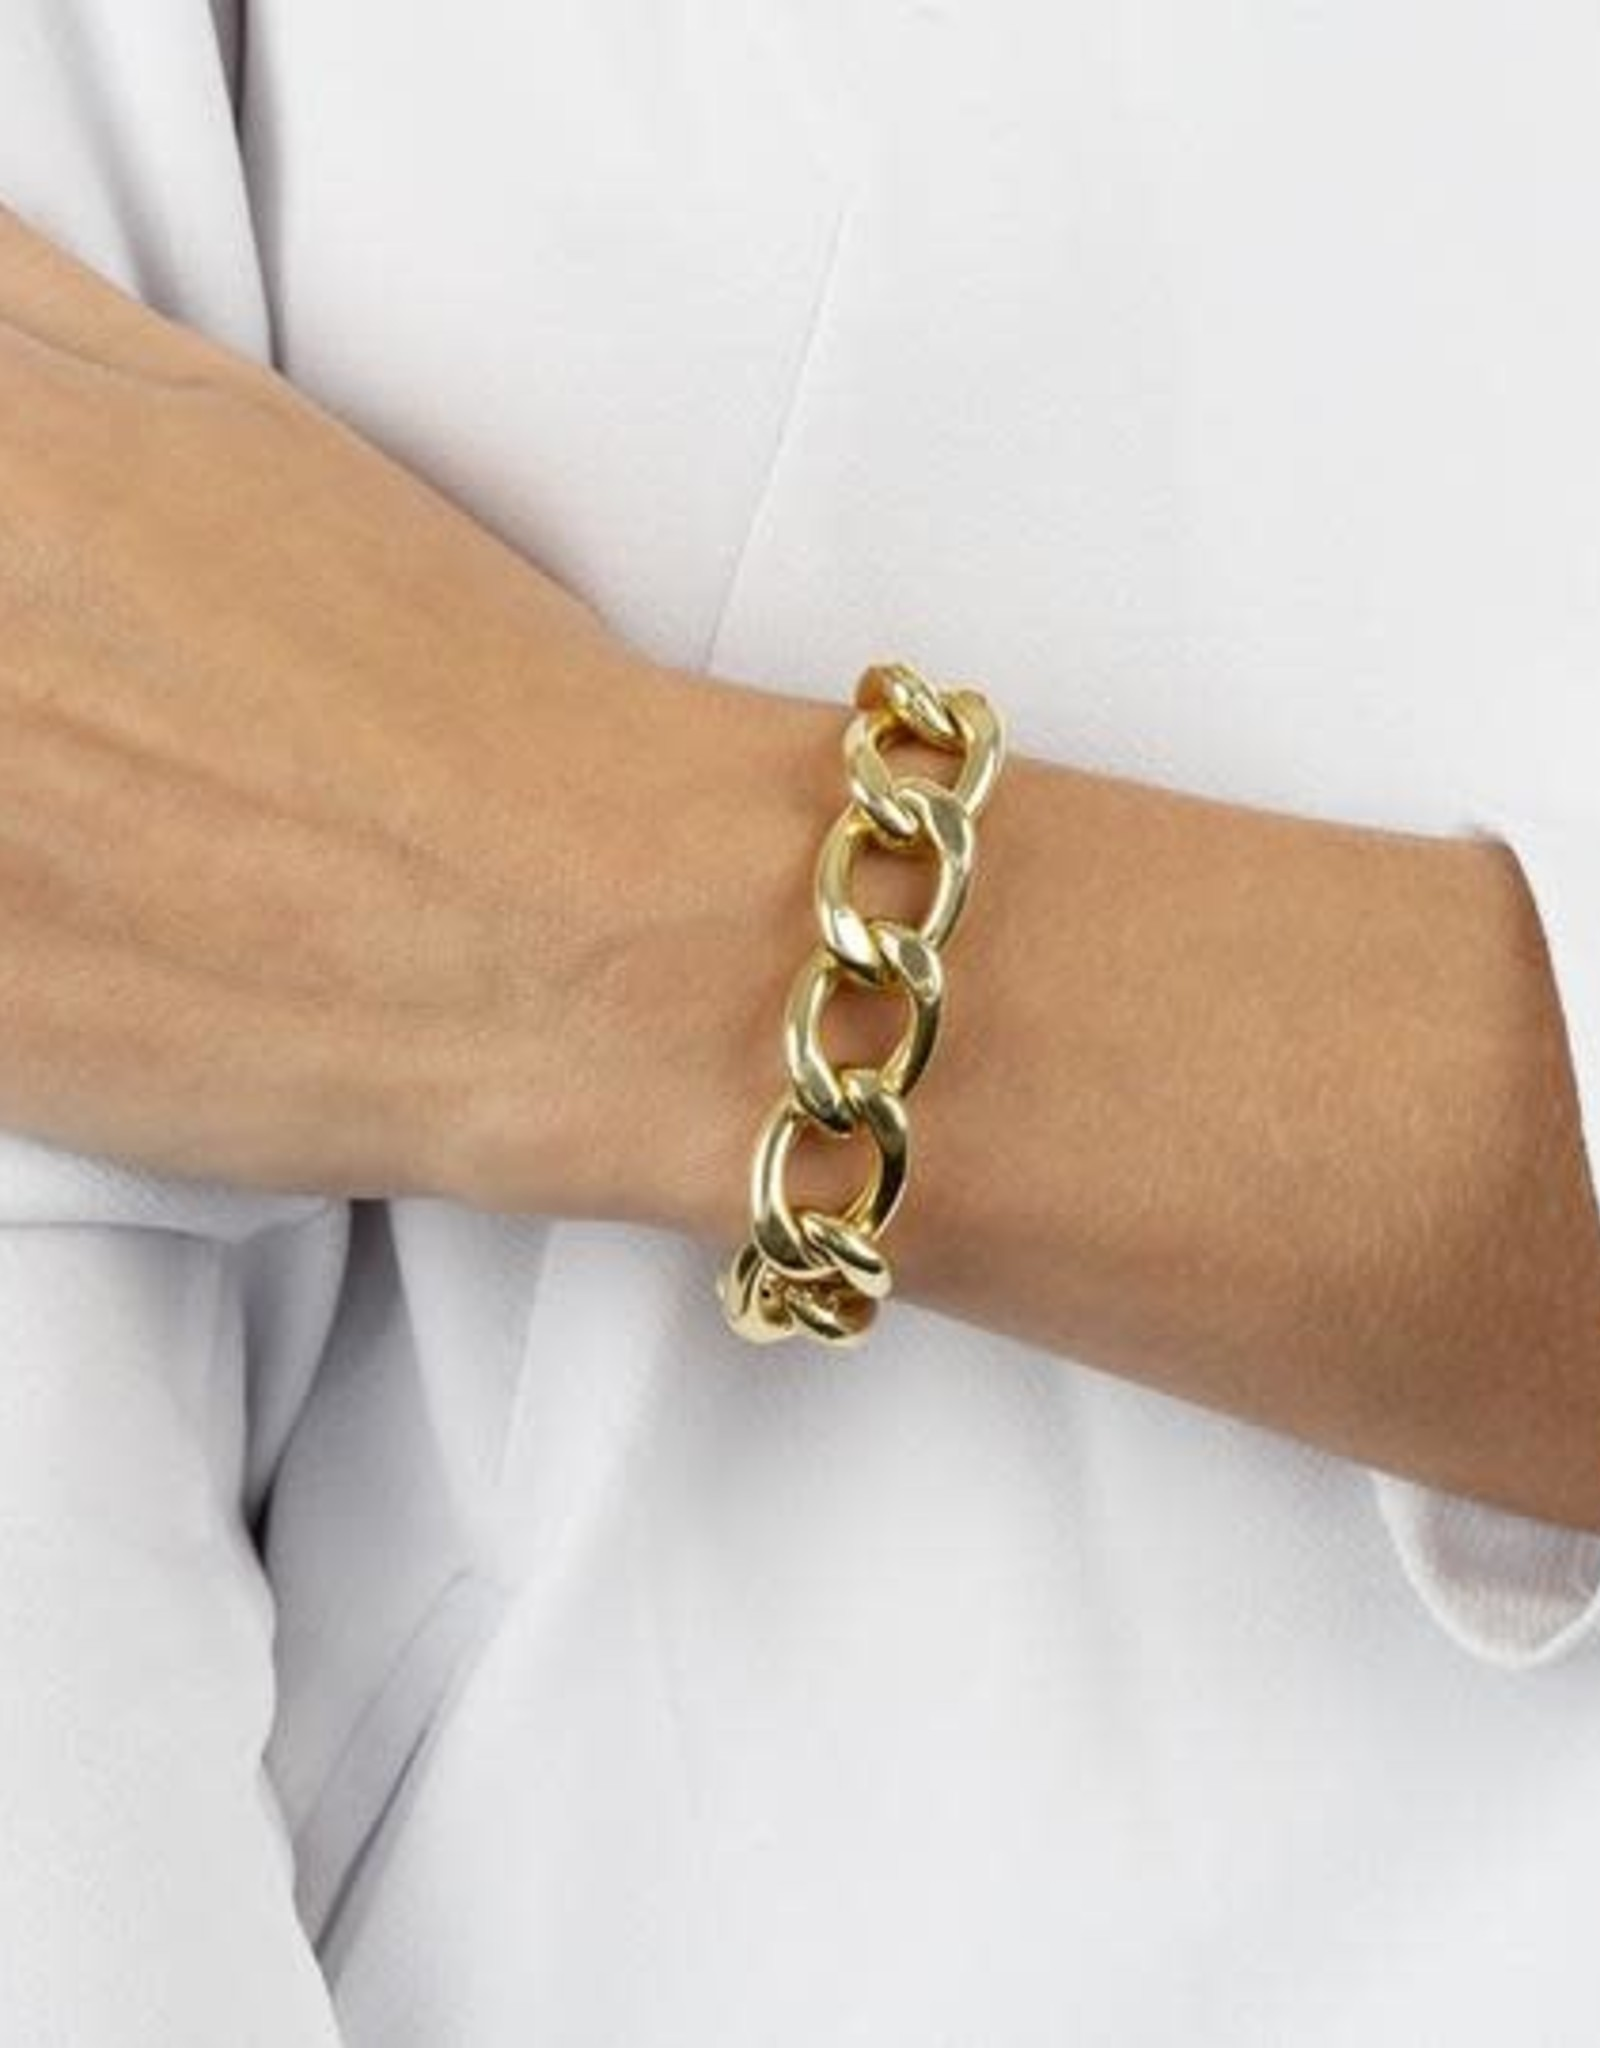 Adinas XL Miami Curb Link Bracelet